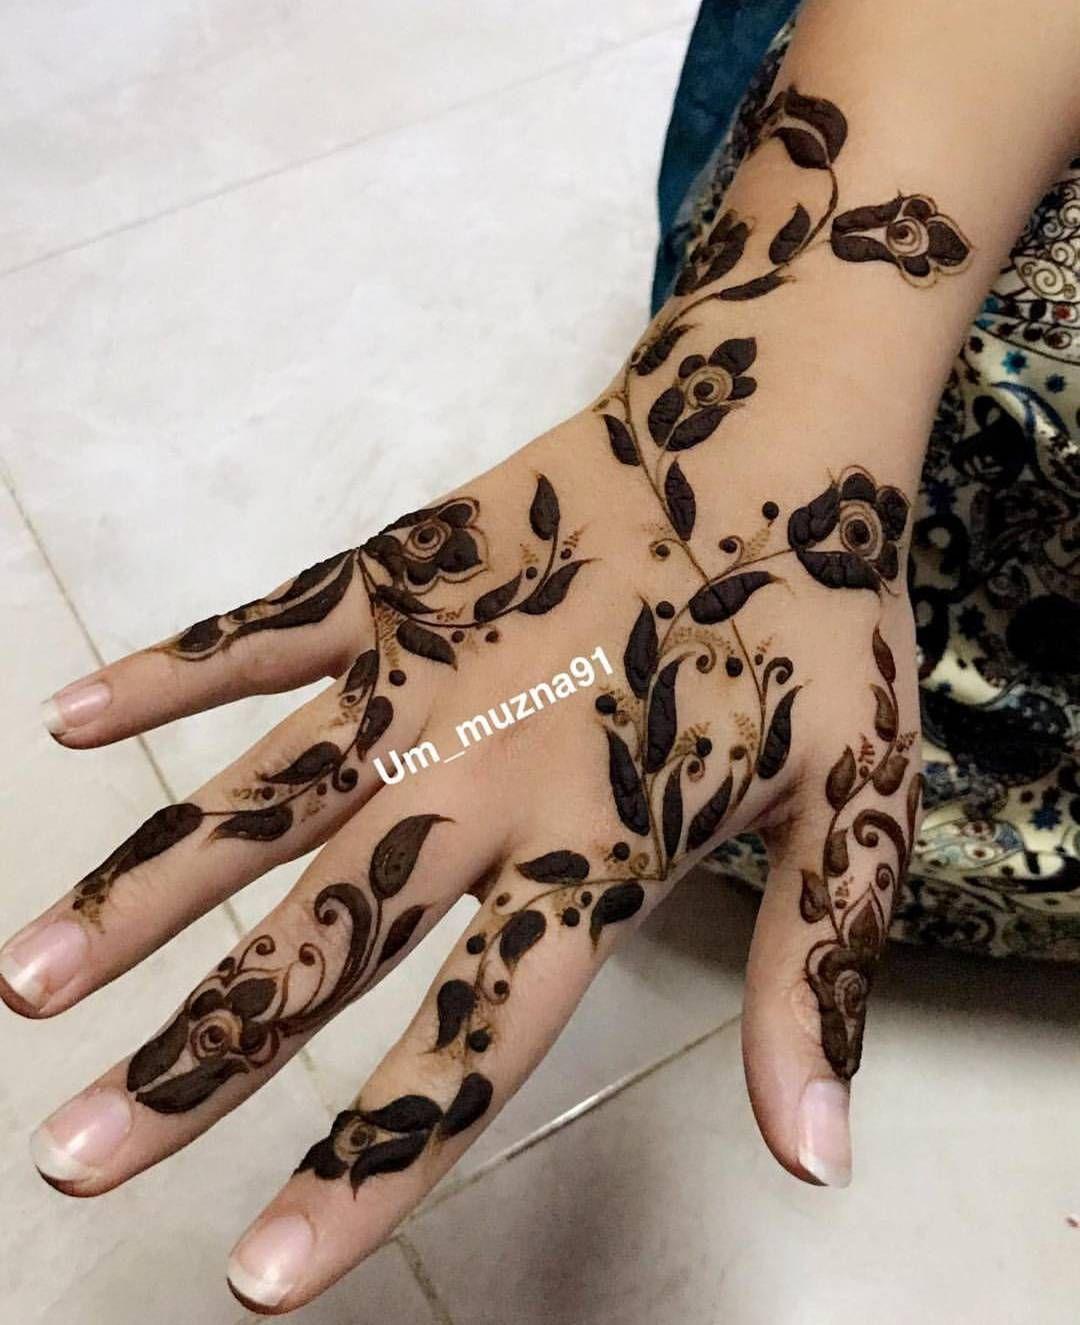 Contact For Henna Services Regular Bridal Henna Available Call Whatsapp 0528110862 Alain Ua Henna Tattoo Designs Modern Mehndi Designs Unique Mehndi Designs